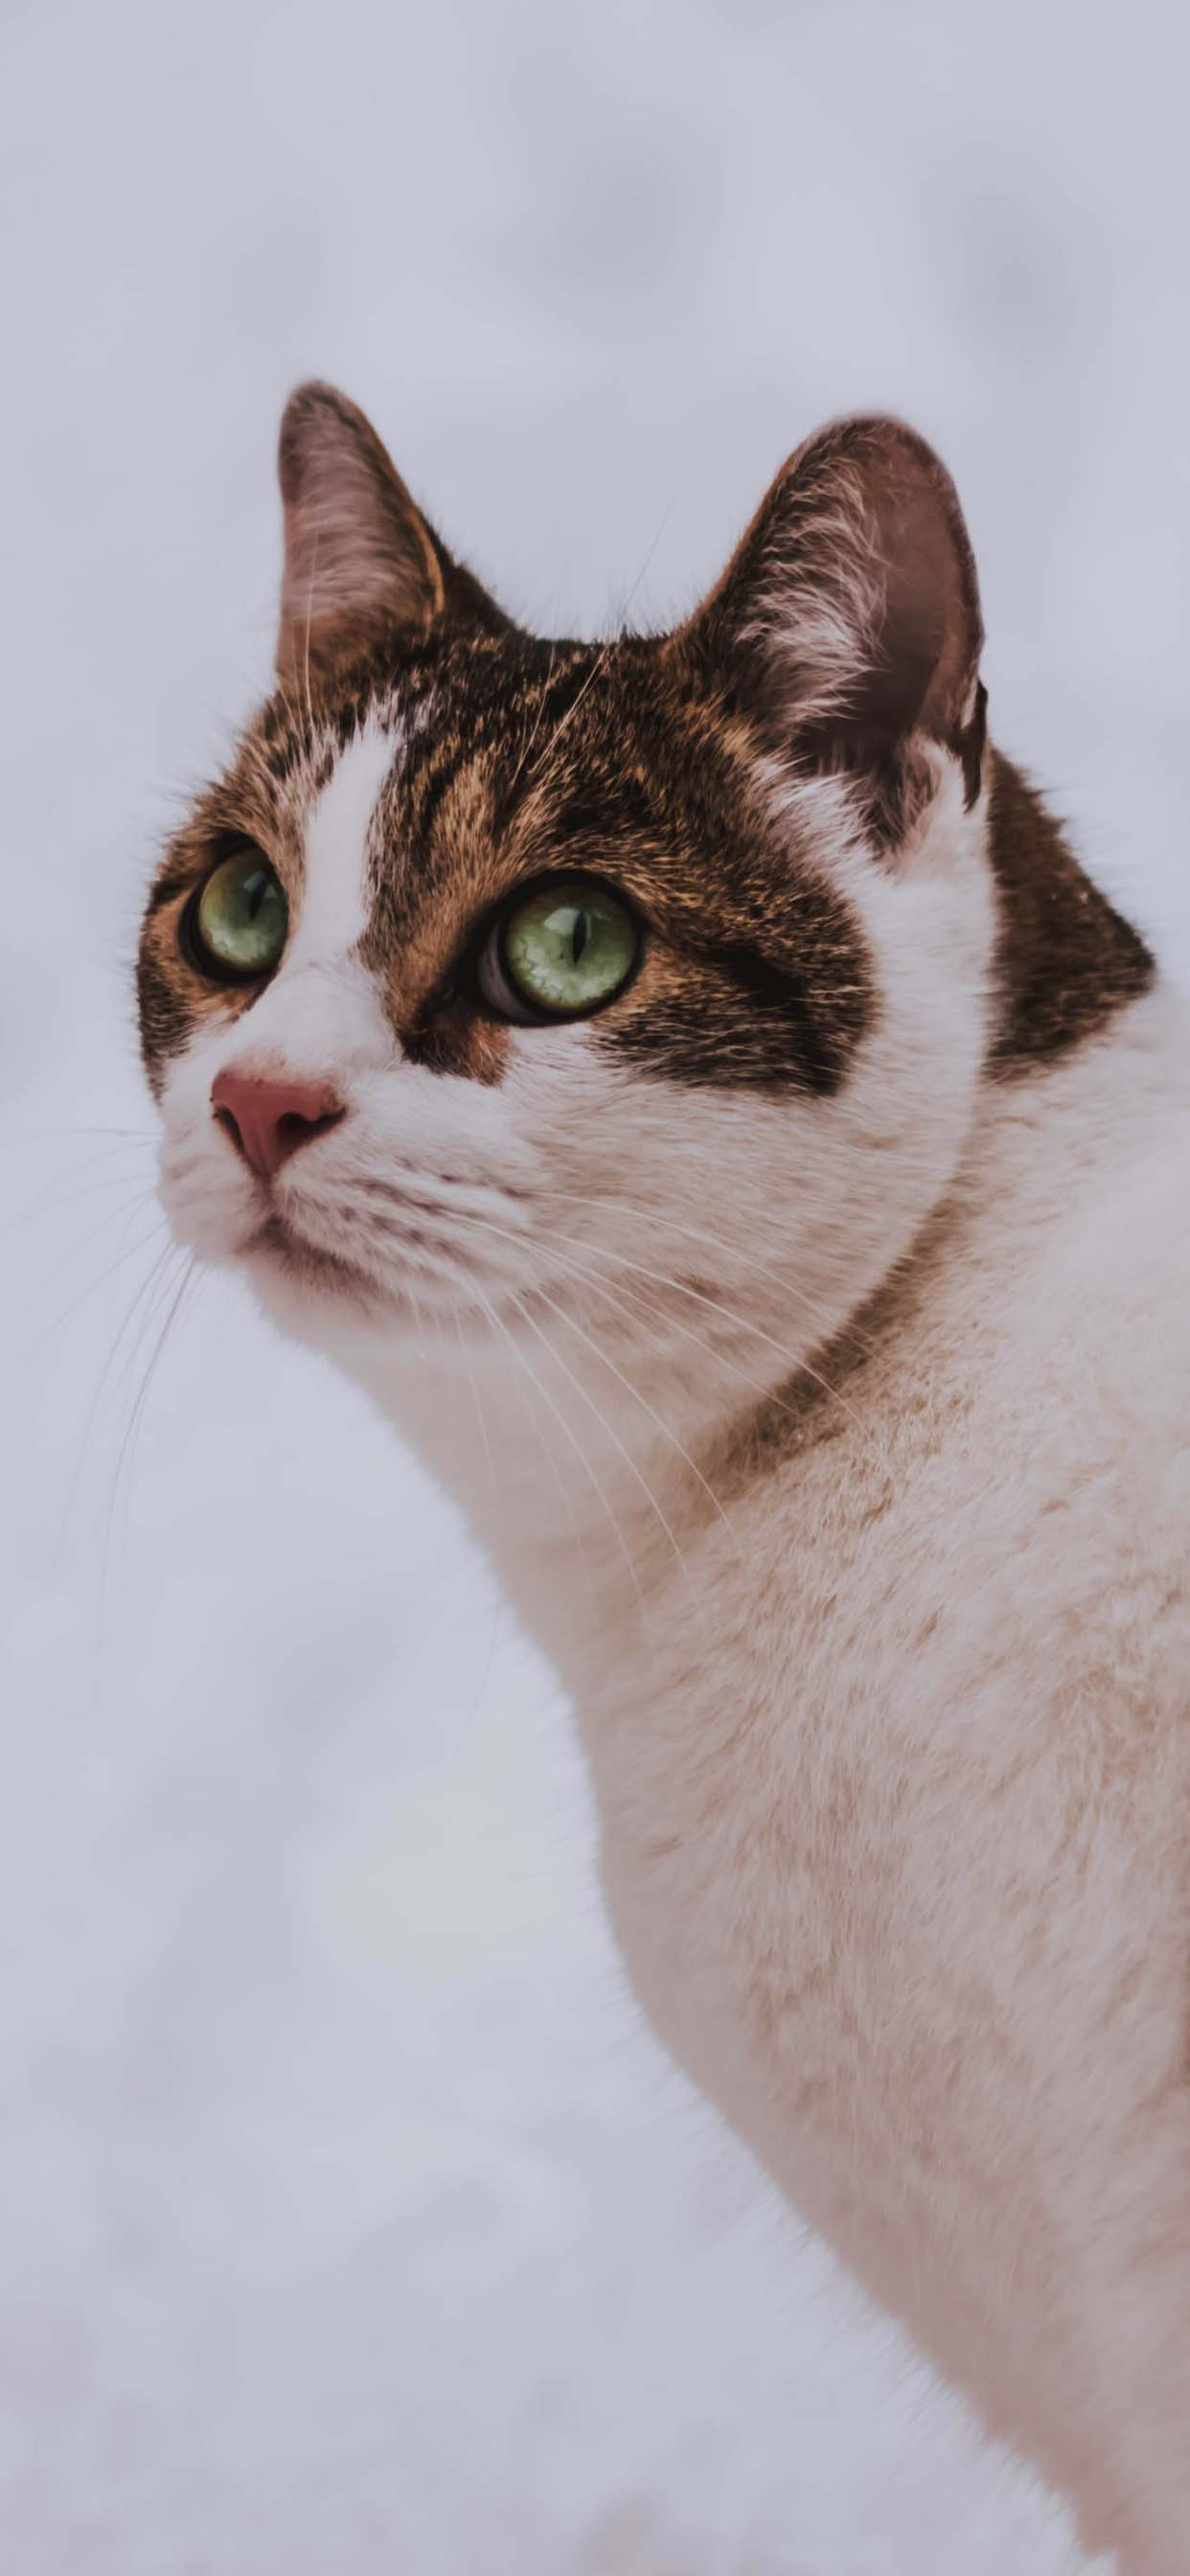 Beautiful Cat Portrait - iPhone Wallpaper